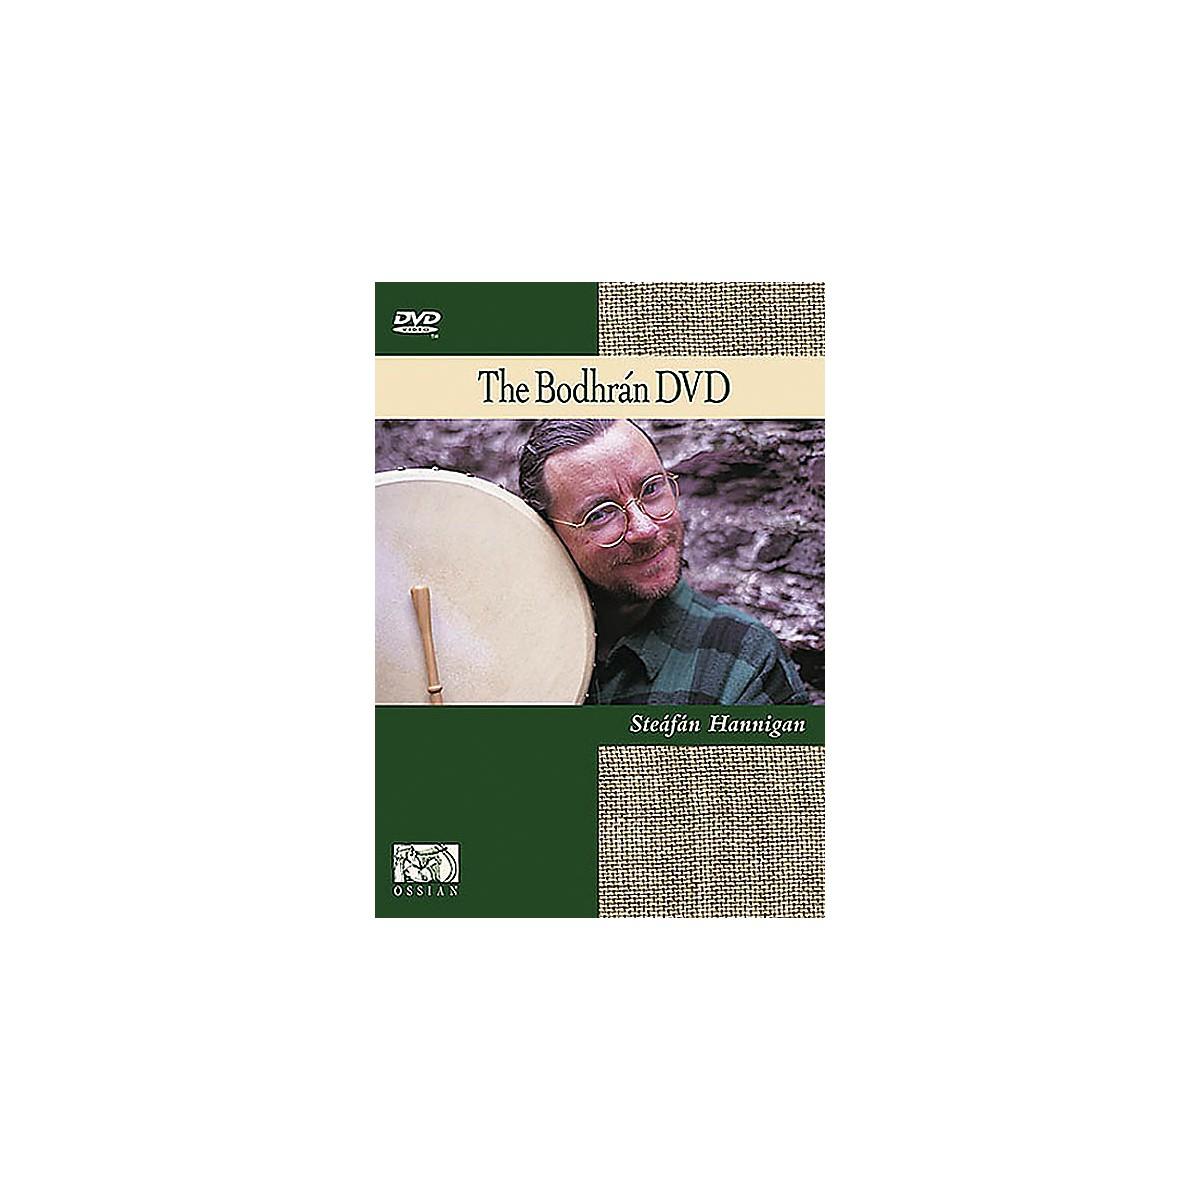 Music Sales The Bodhrán DVD Music Sales America Series DVD Written by Steáfán Hannigan